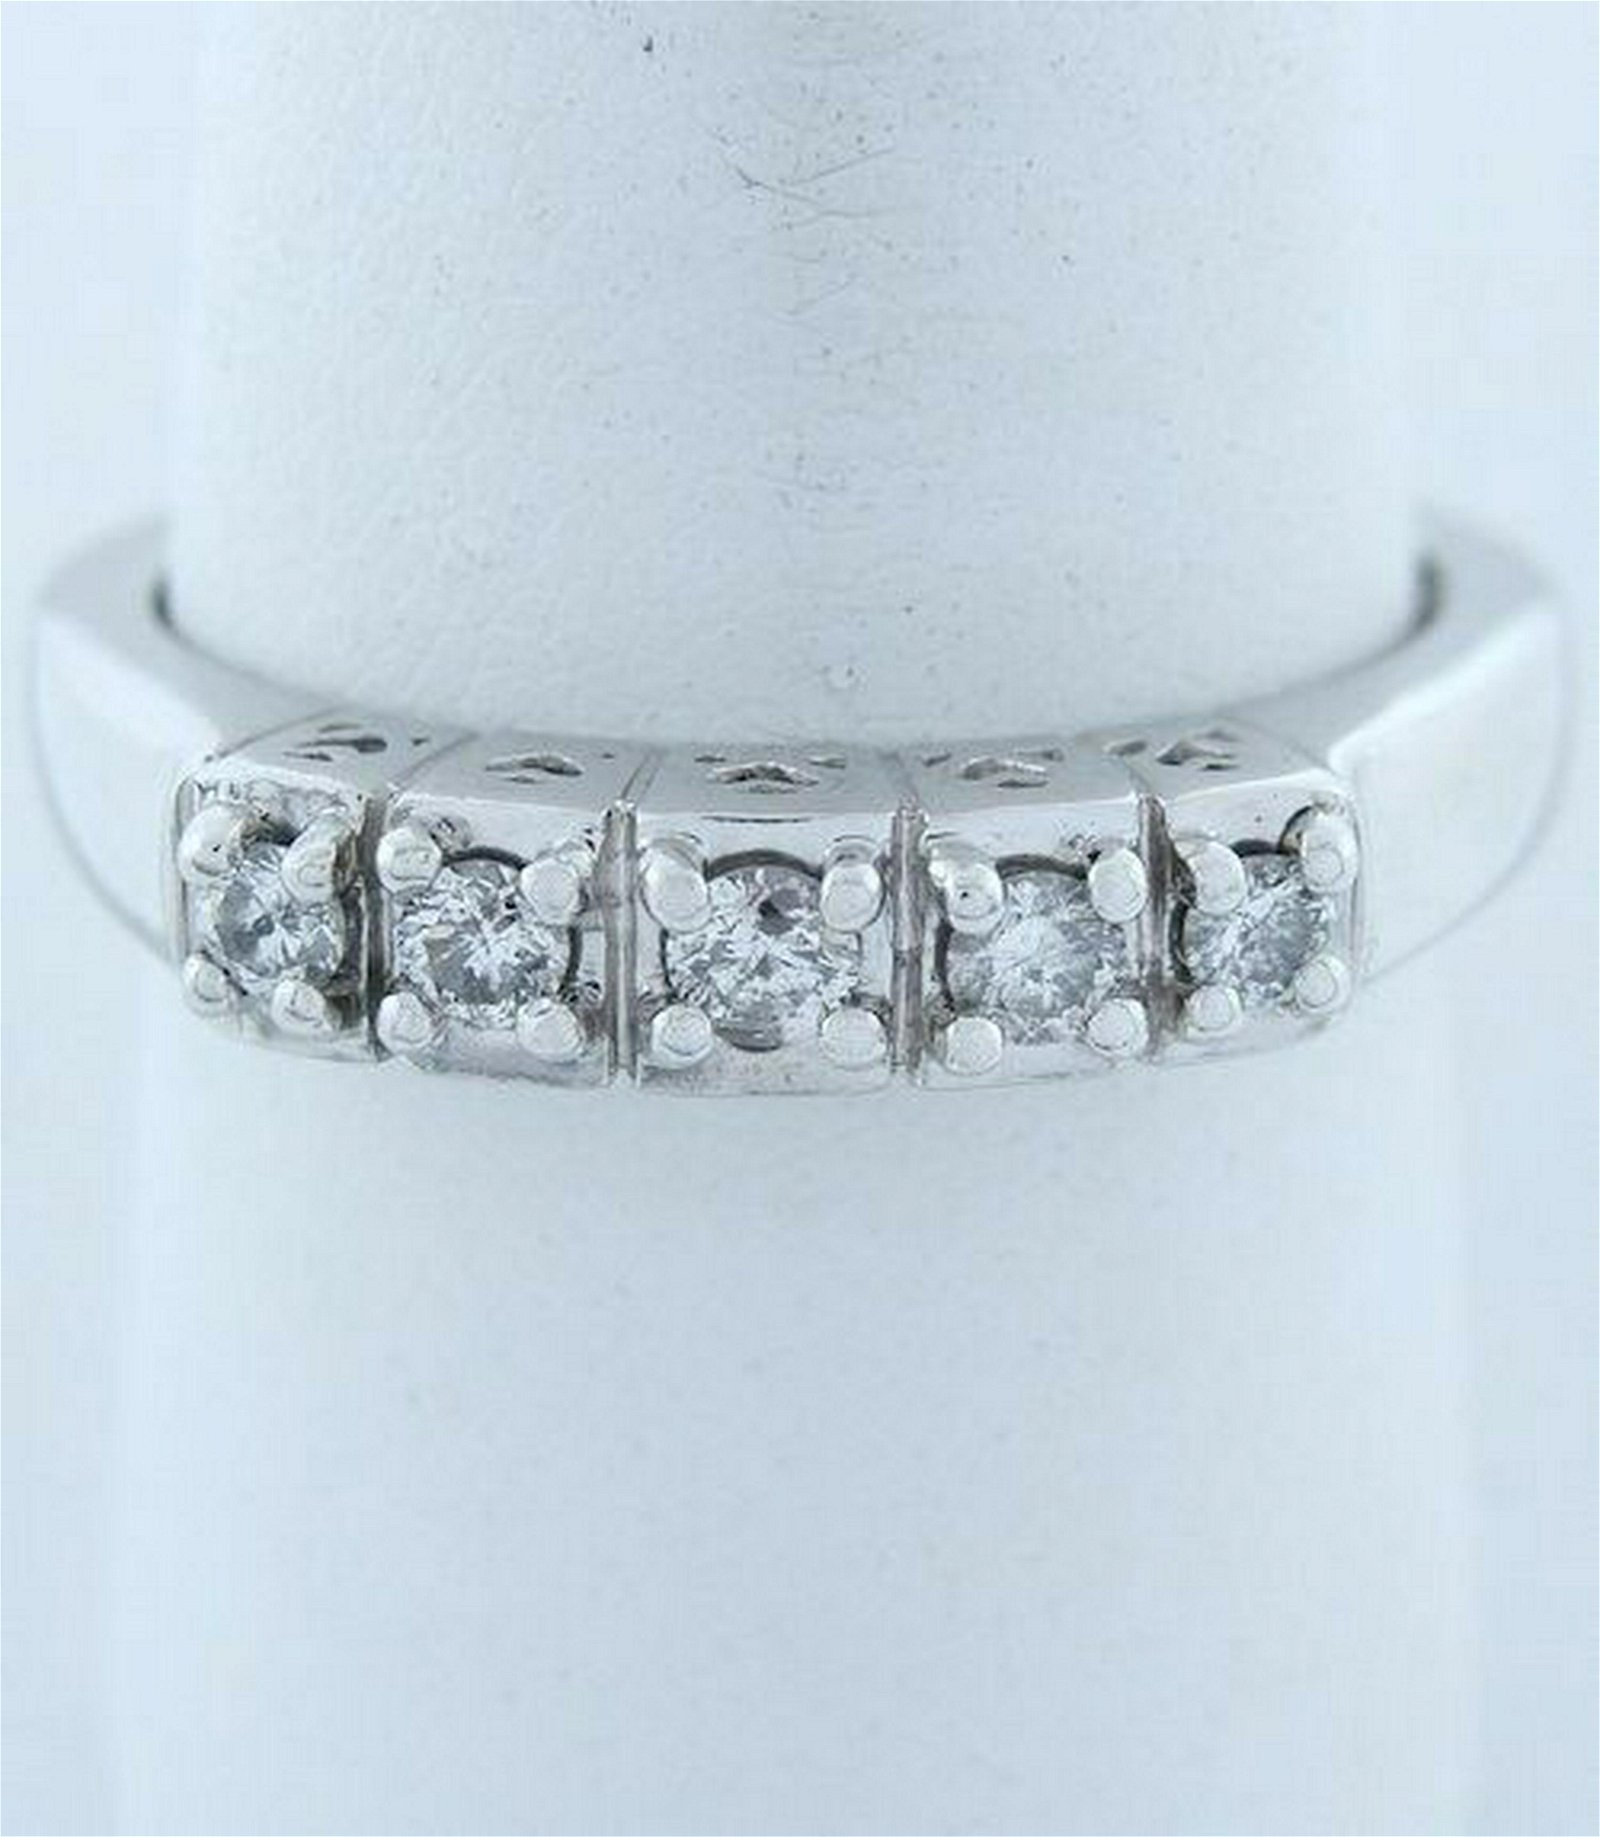 14K WHITE GOLD 1/4ct 5 ROUND DIAMOND HEART WEDDING BAND